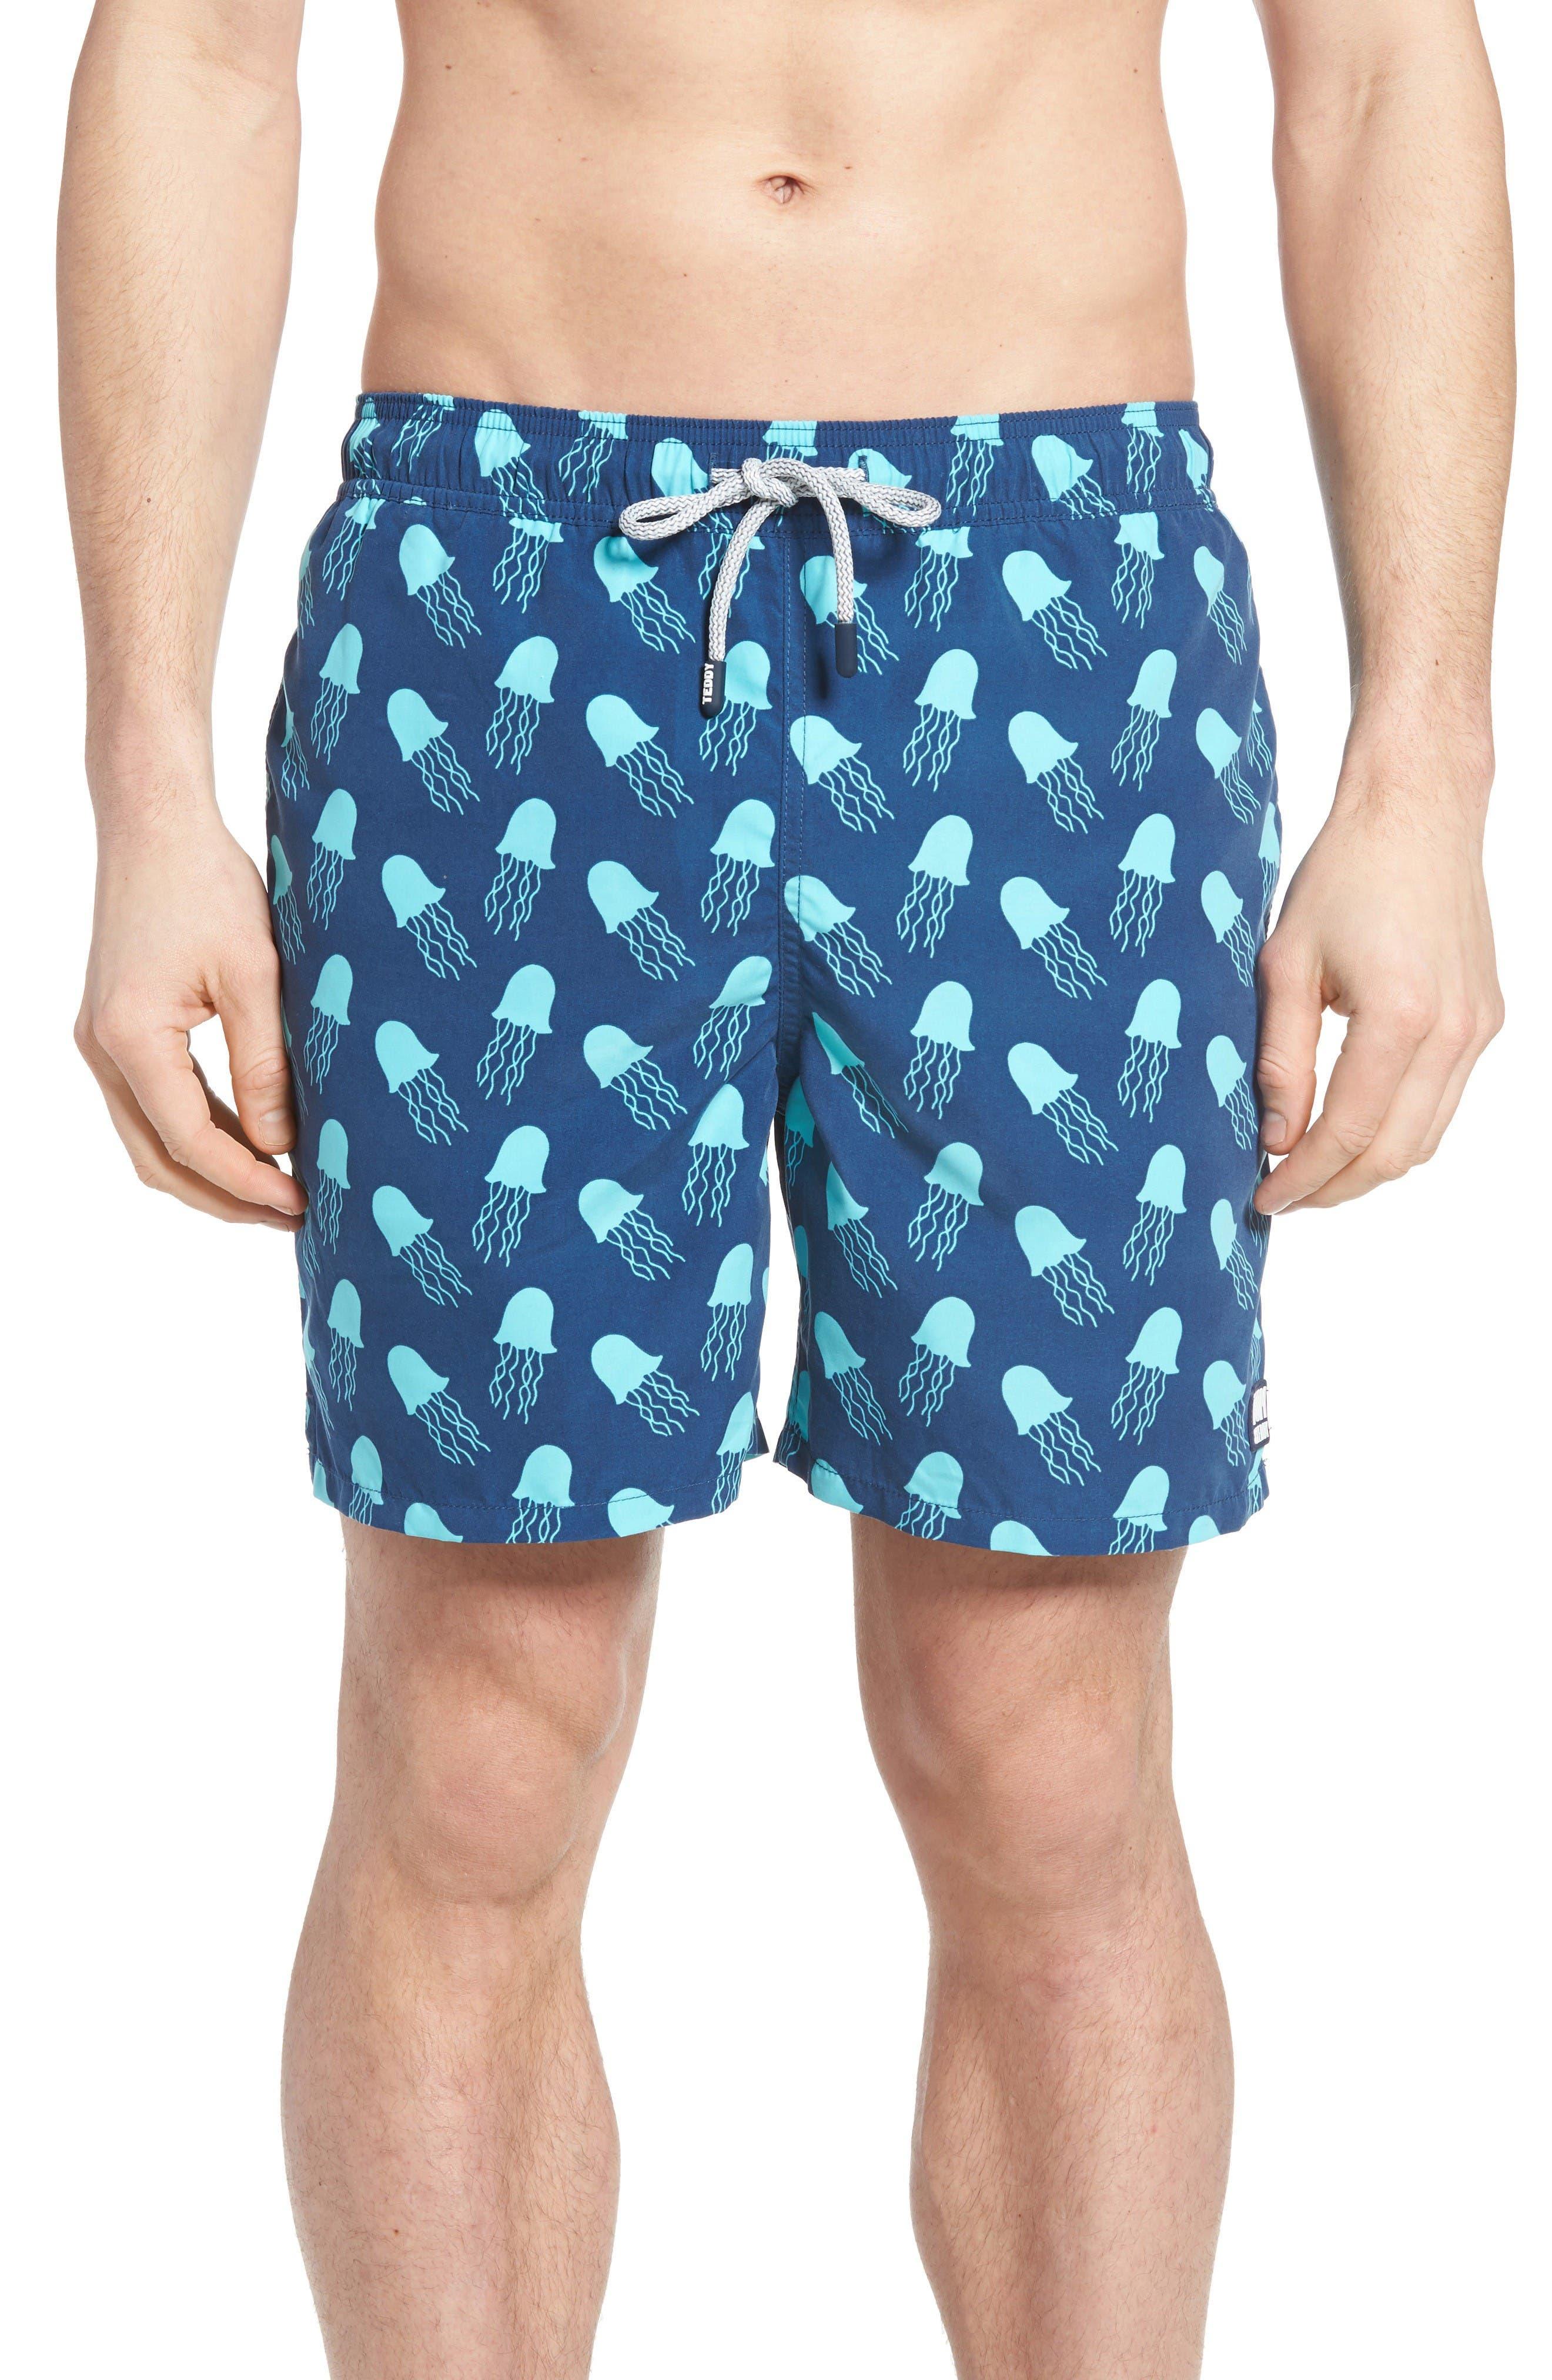 Main Image - Tom & Teddy Jellyfish Print Swim Trunks